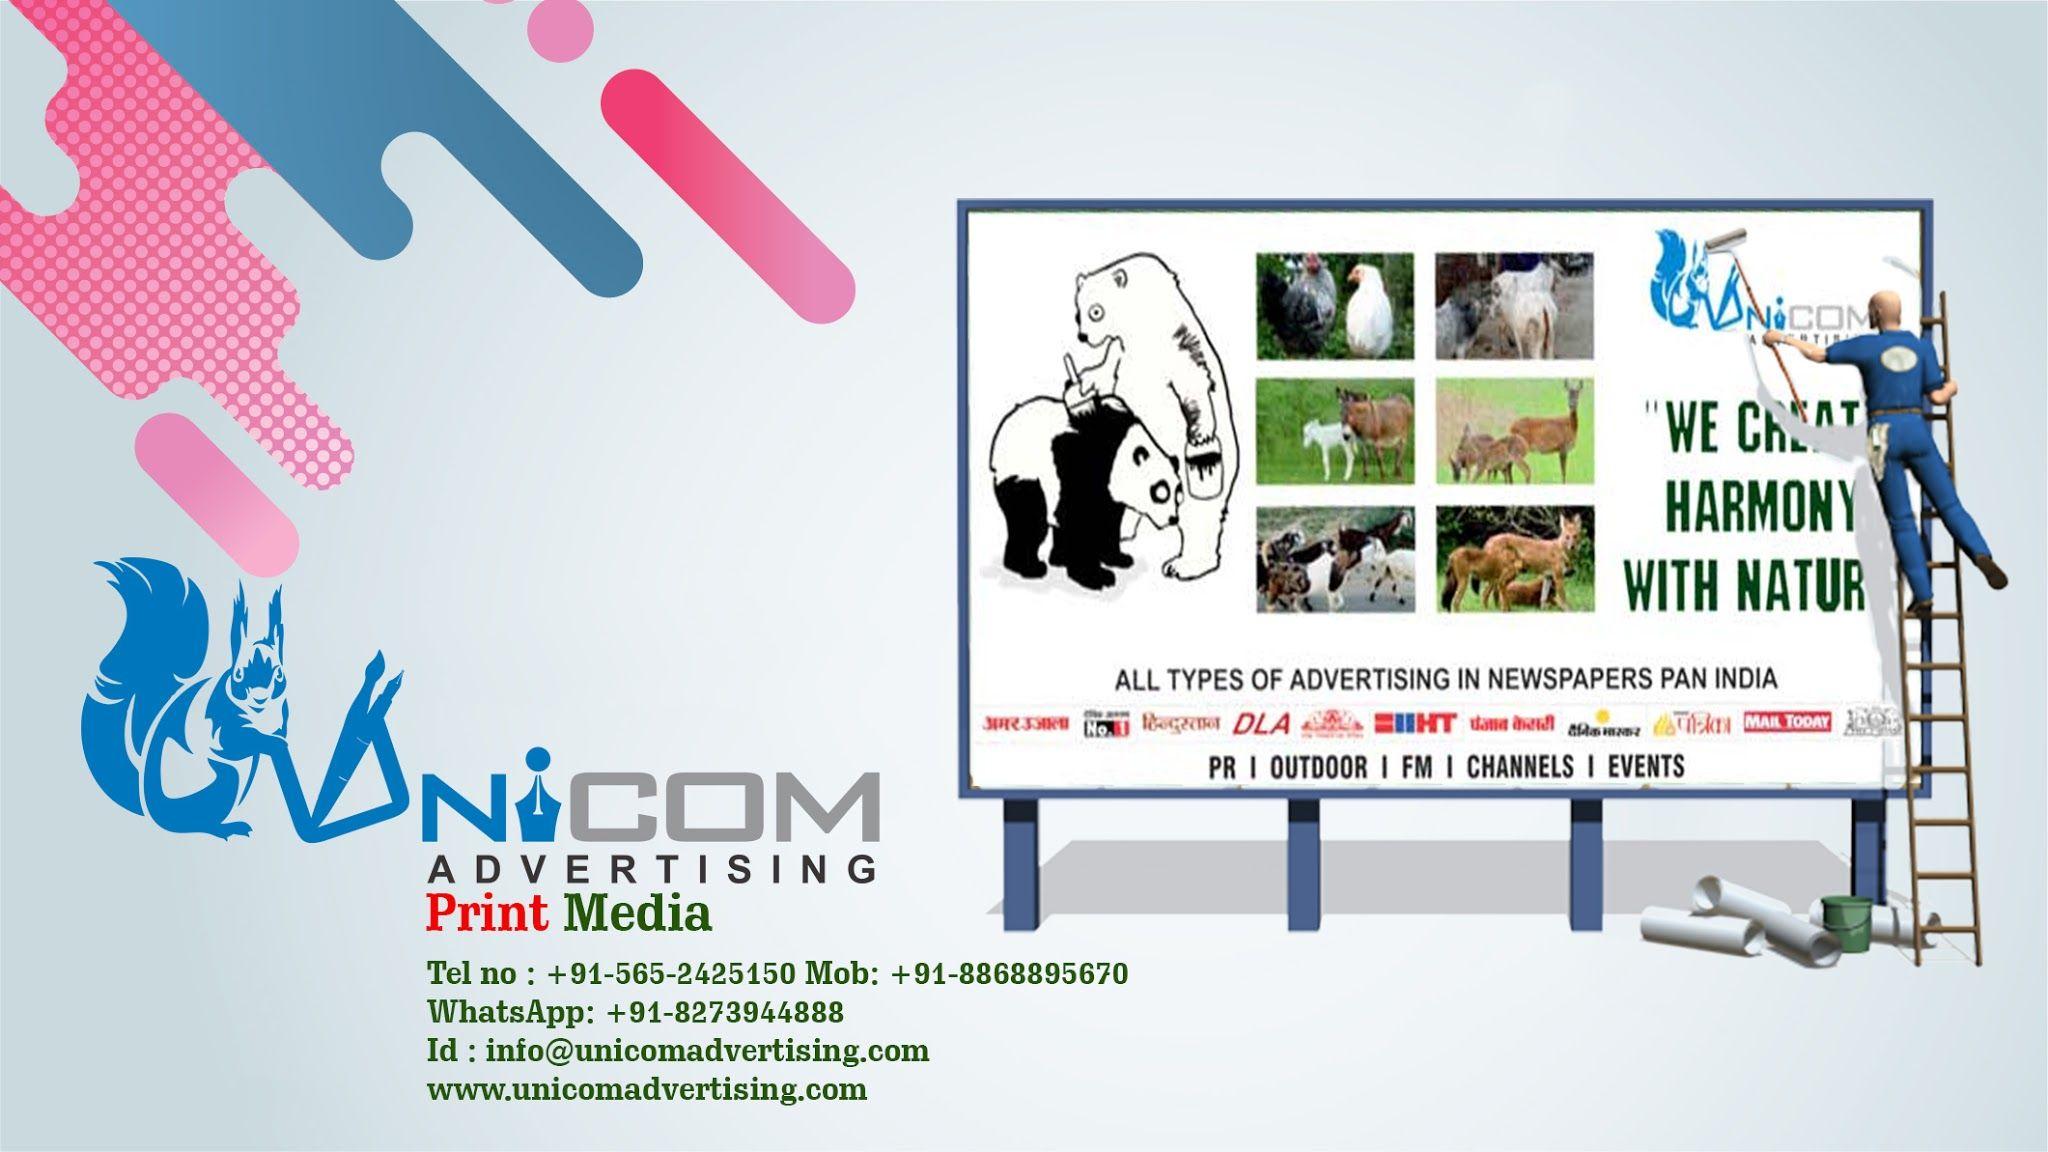 Most Creative Advertising Agencies